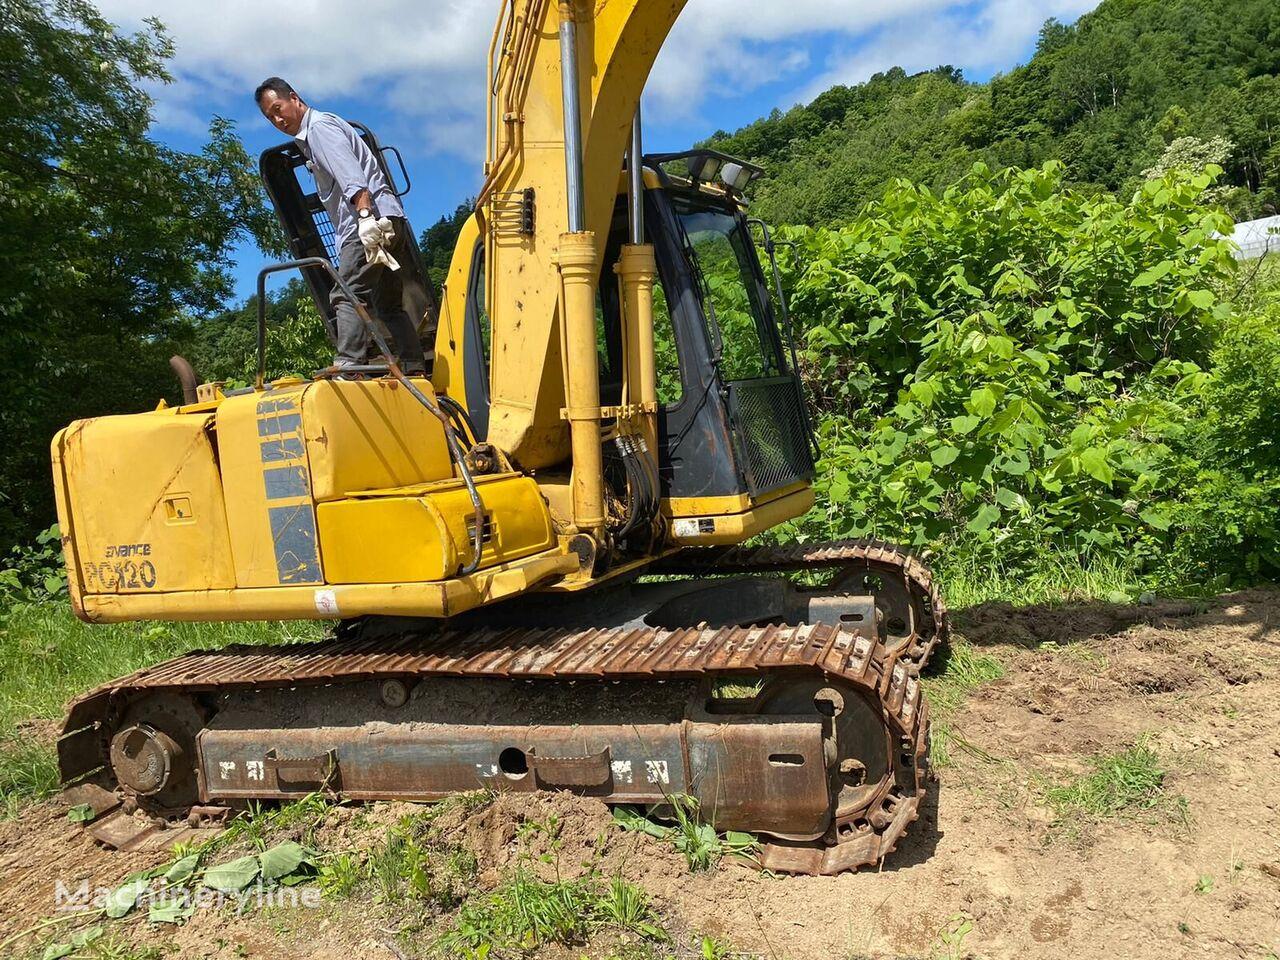 KOMATSU PC120-6EO (Grapple ) tracked excavator